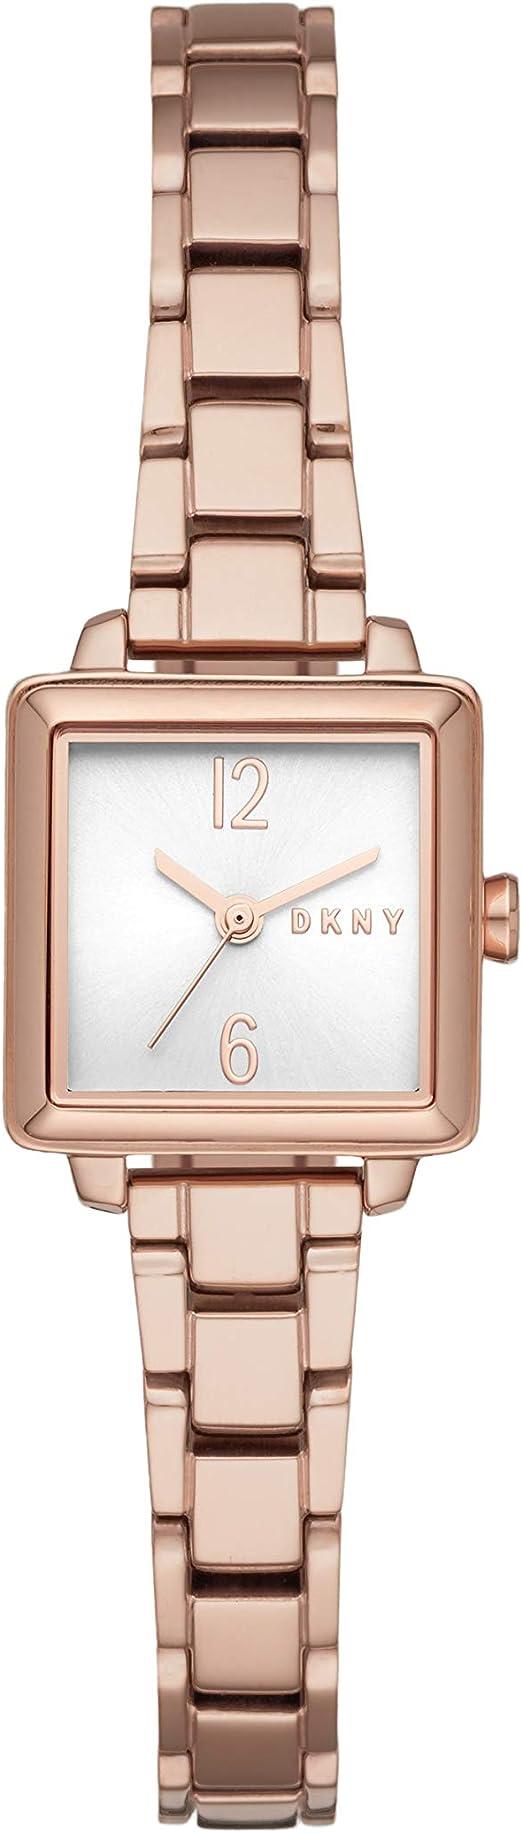 DKNY Women's Crosstown Stainless Steel Dress Quartz Watch